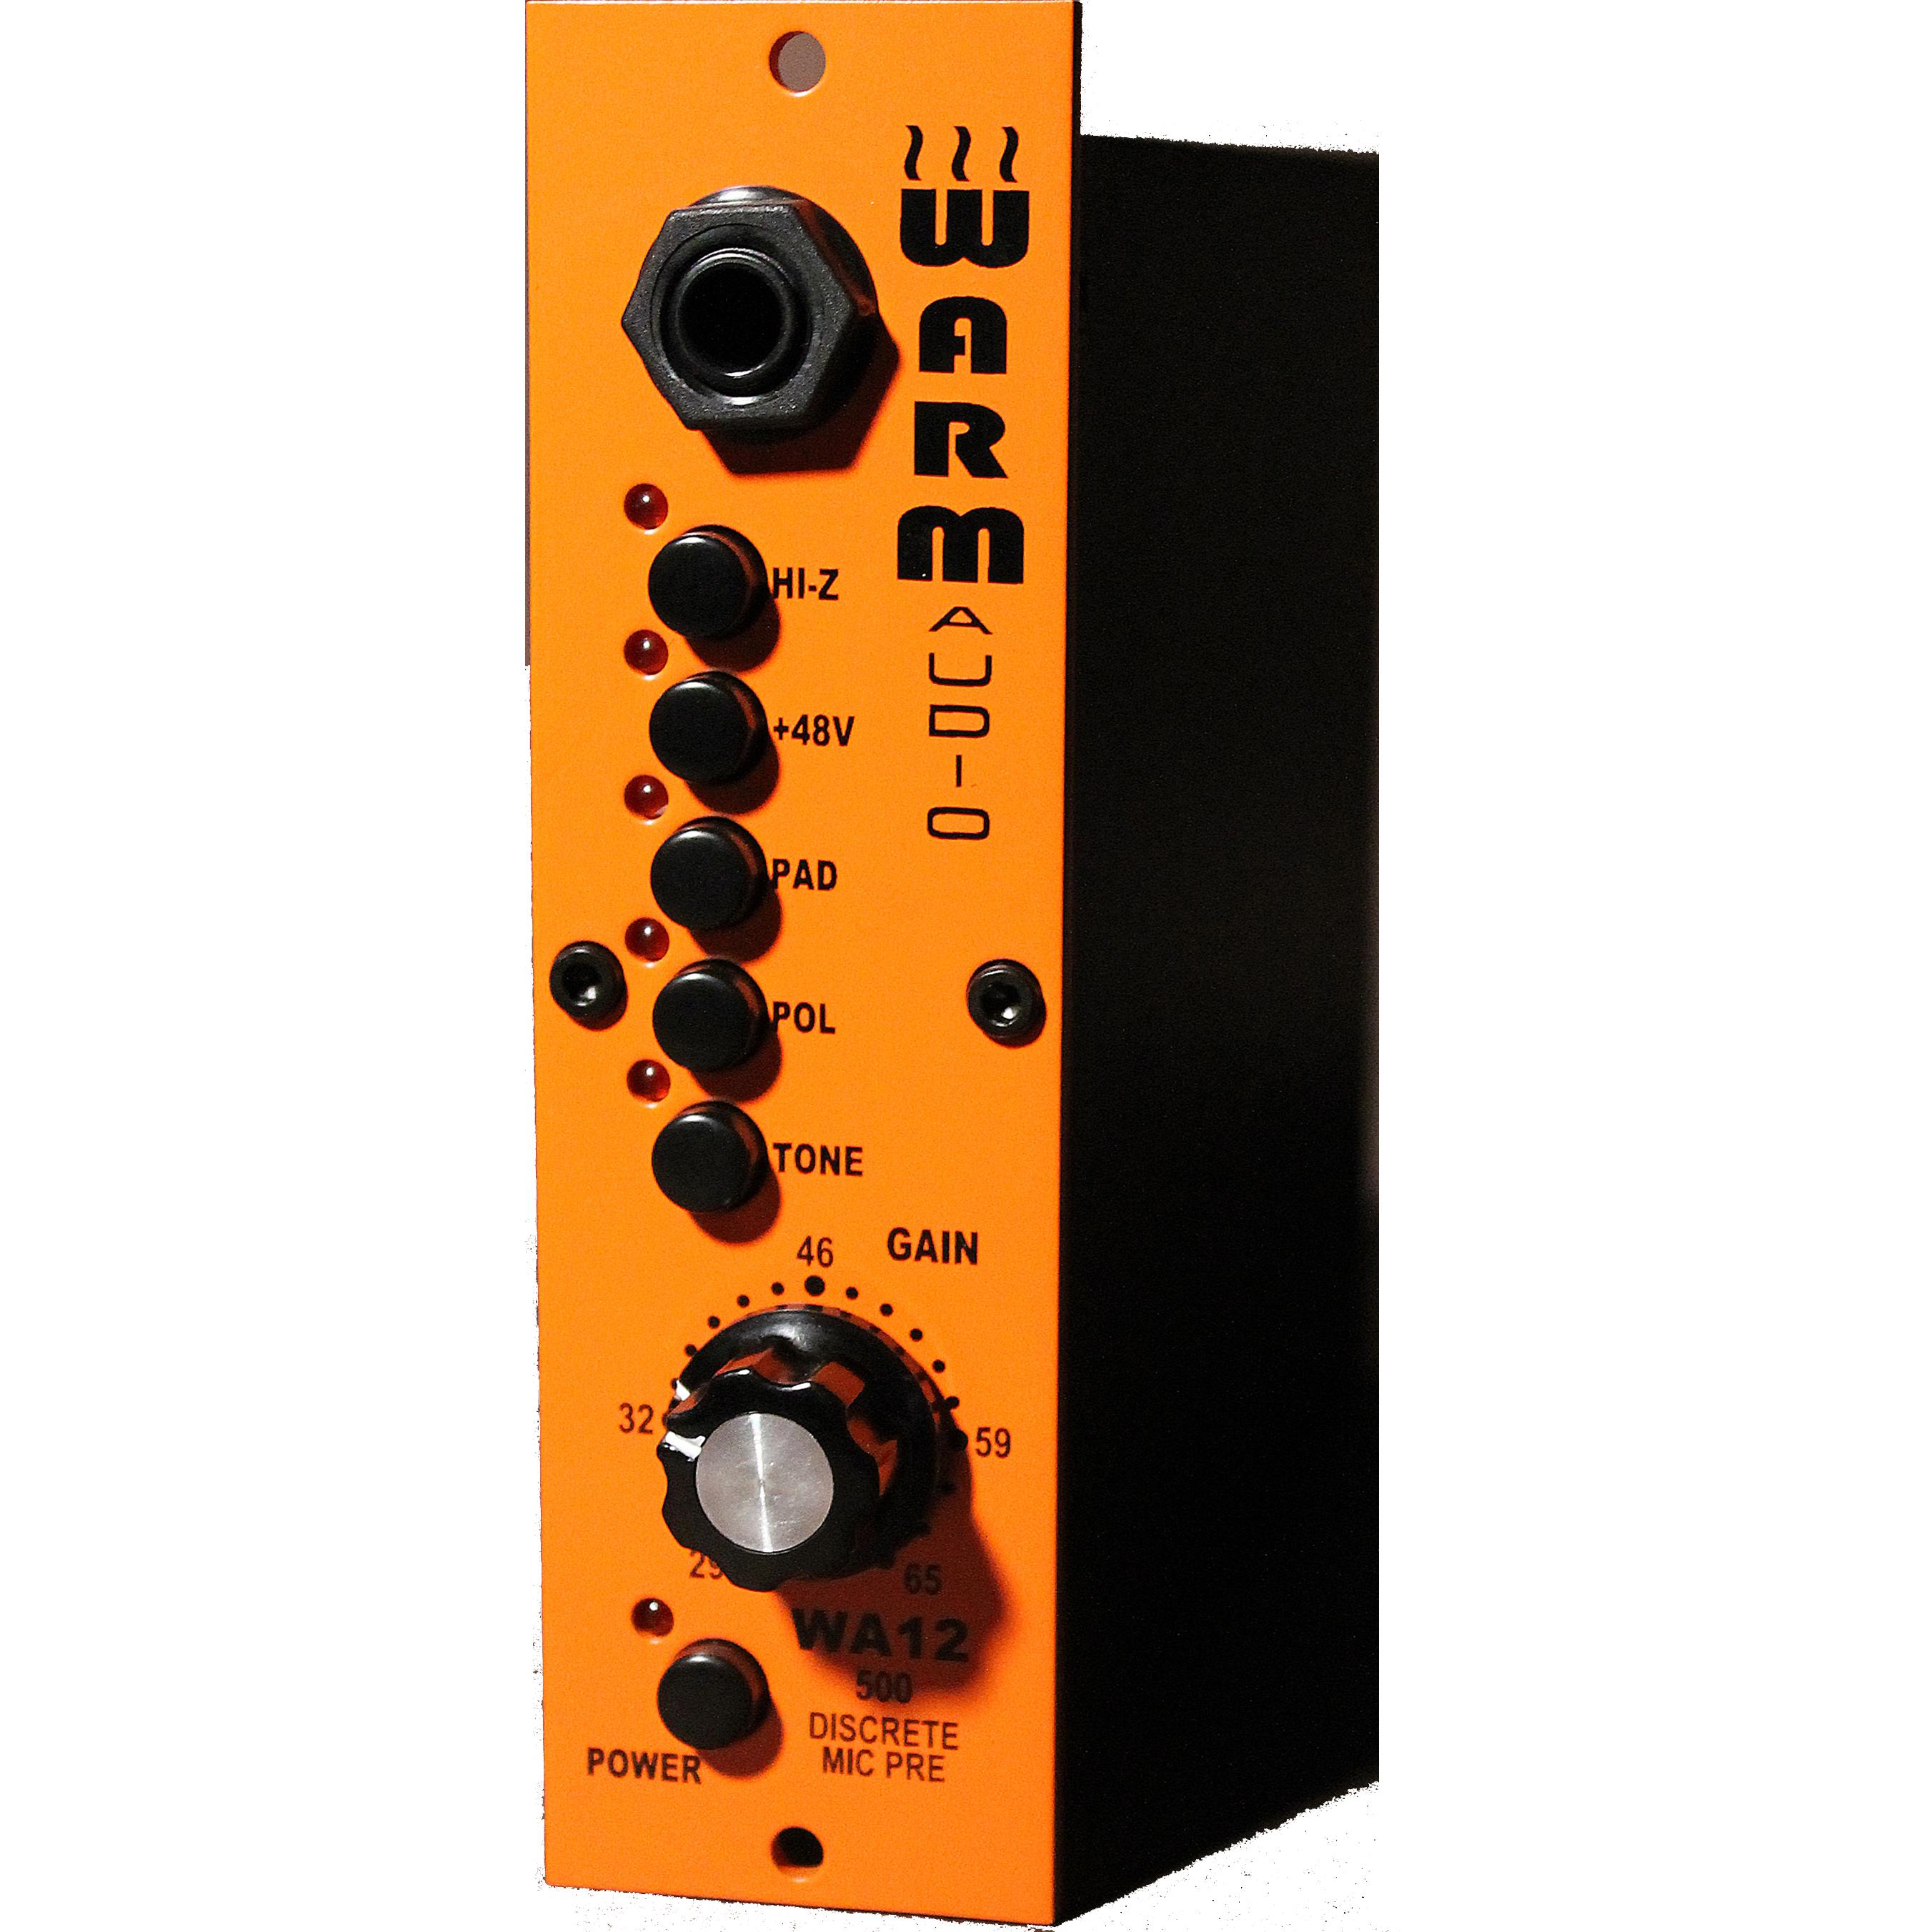 Warm Audio WA12 500 Series Mic Pre